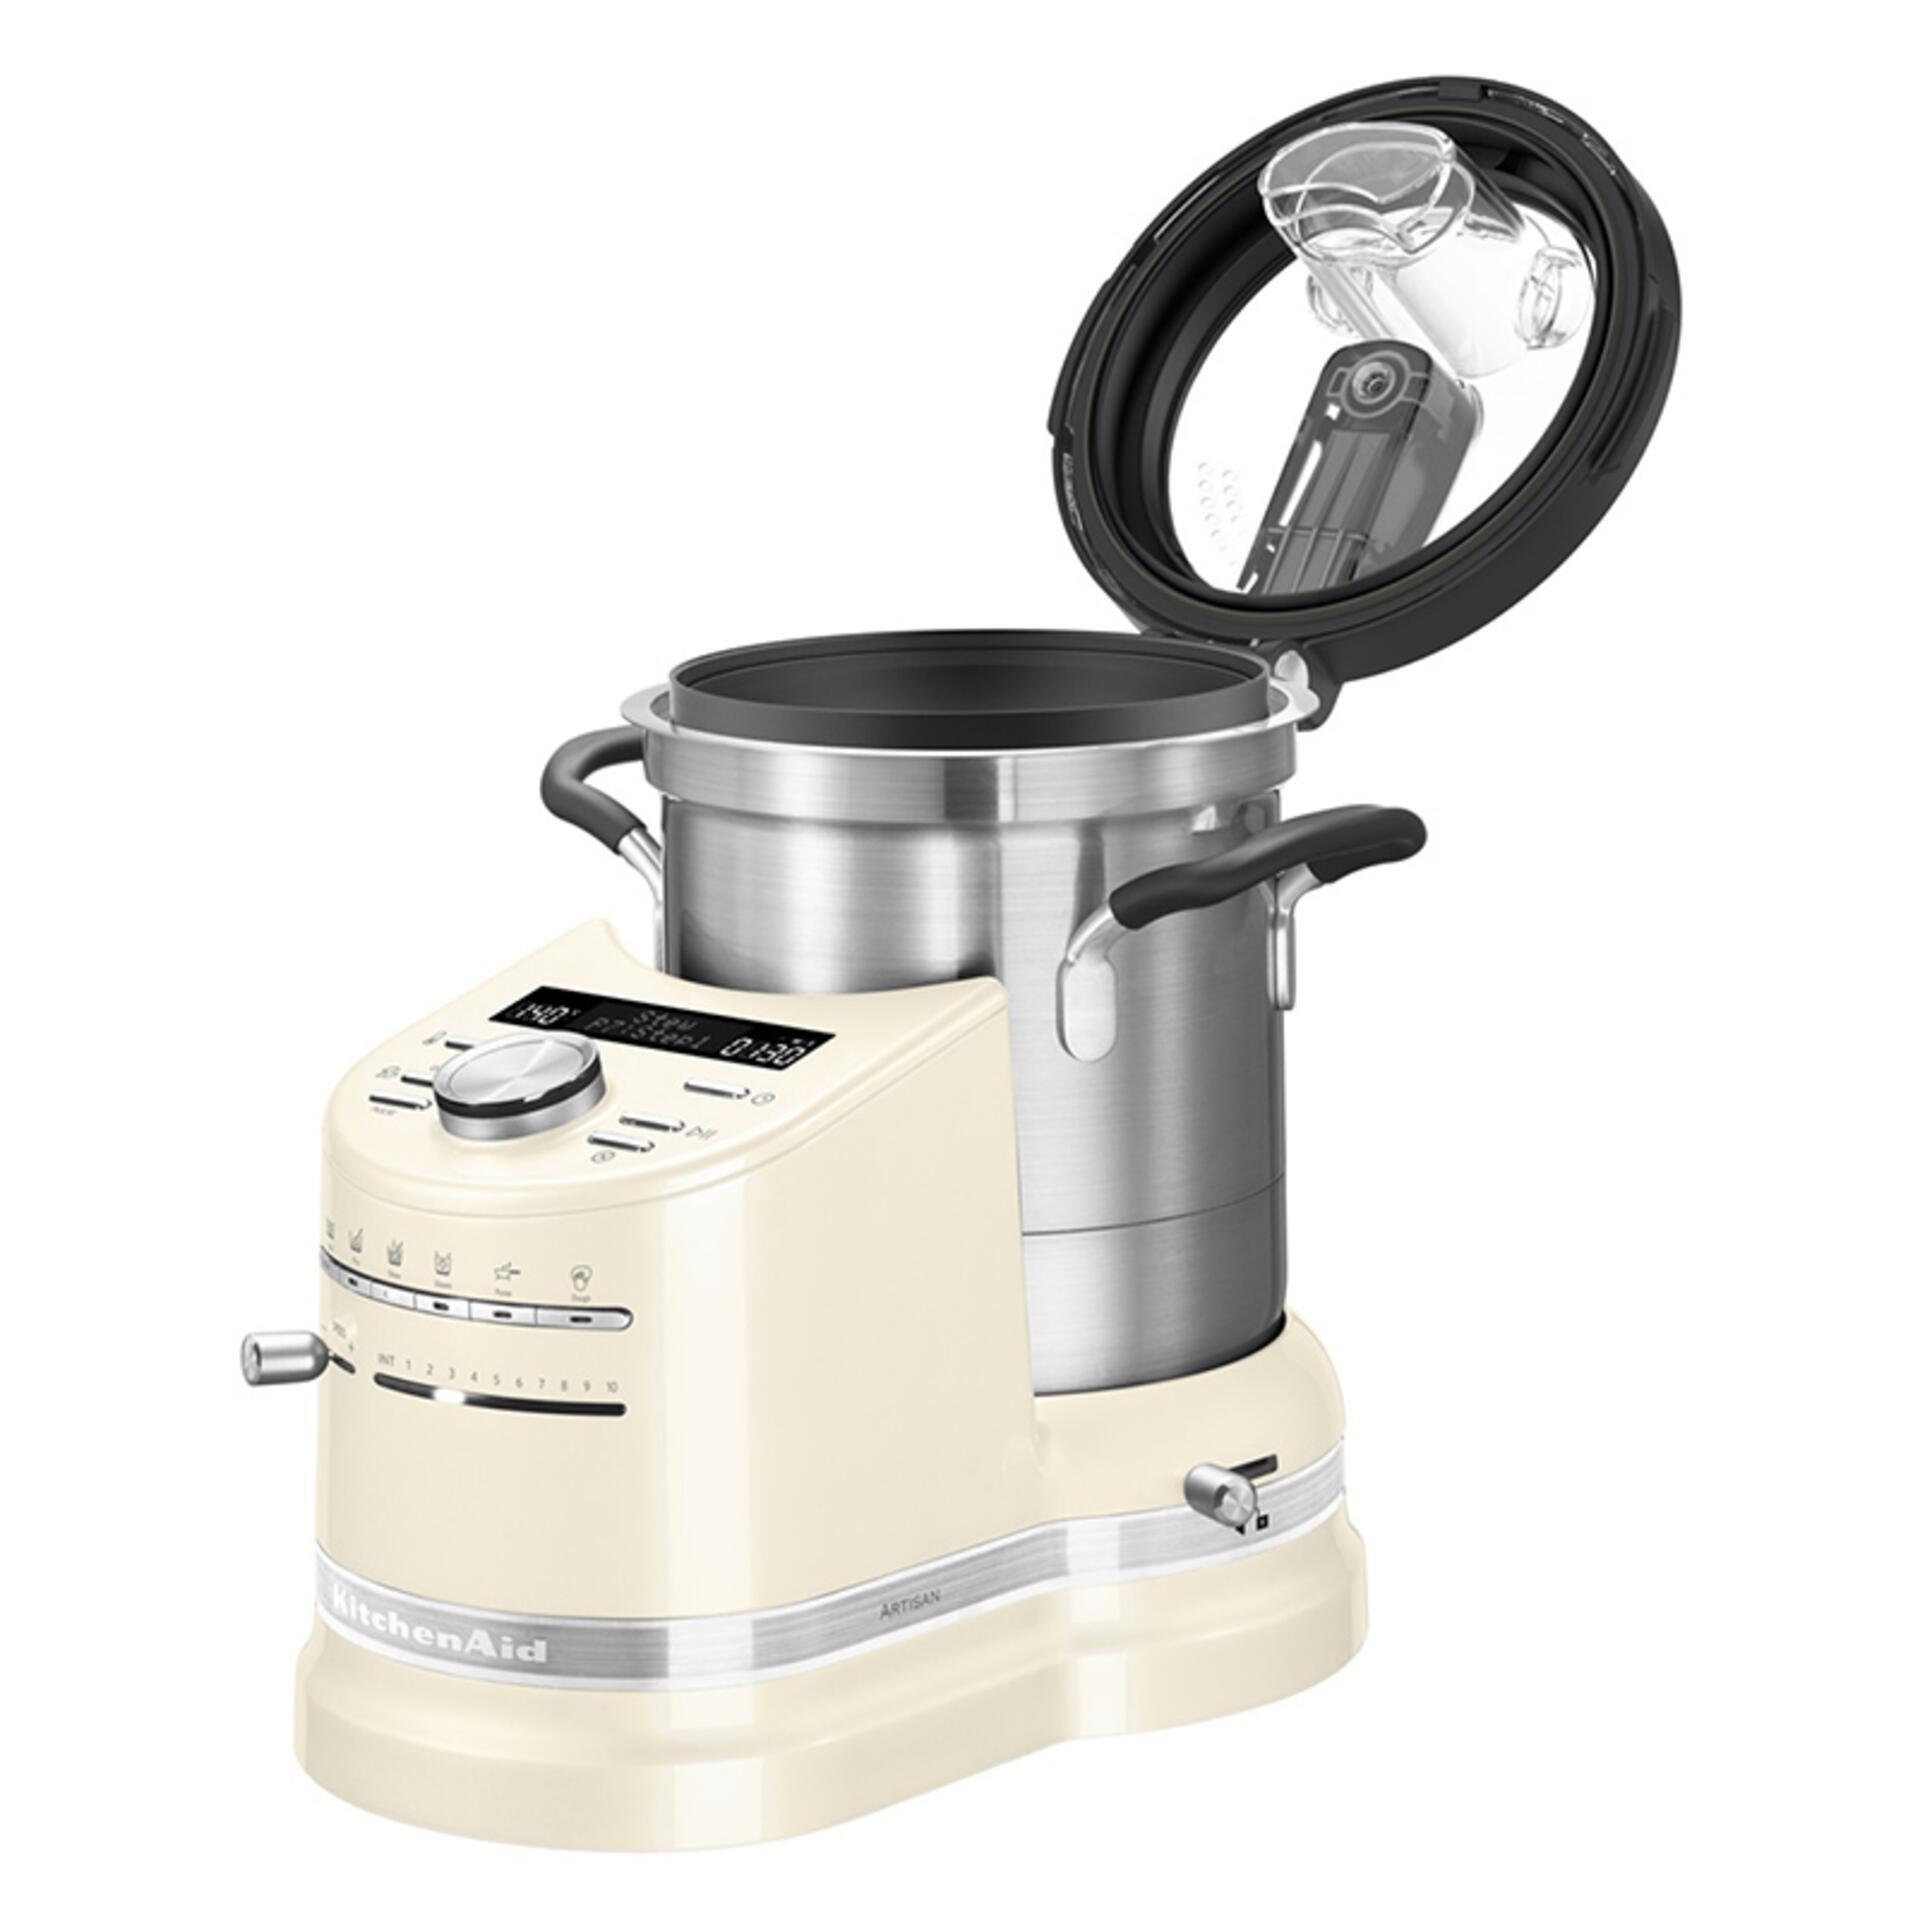 KitchenAid Artisan Cook Processor 5KCF0104EAC/4 Crème